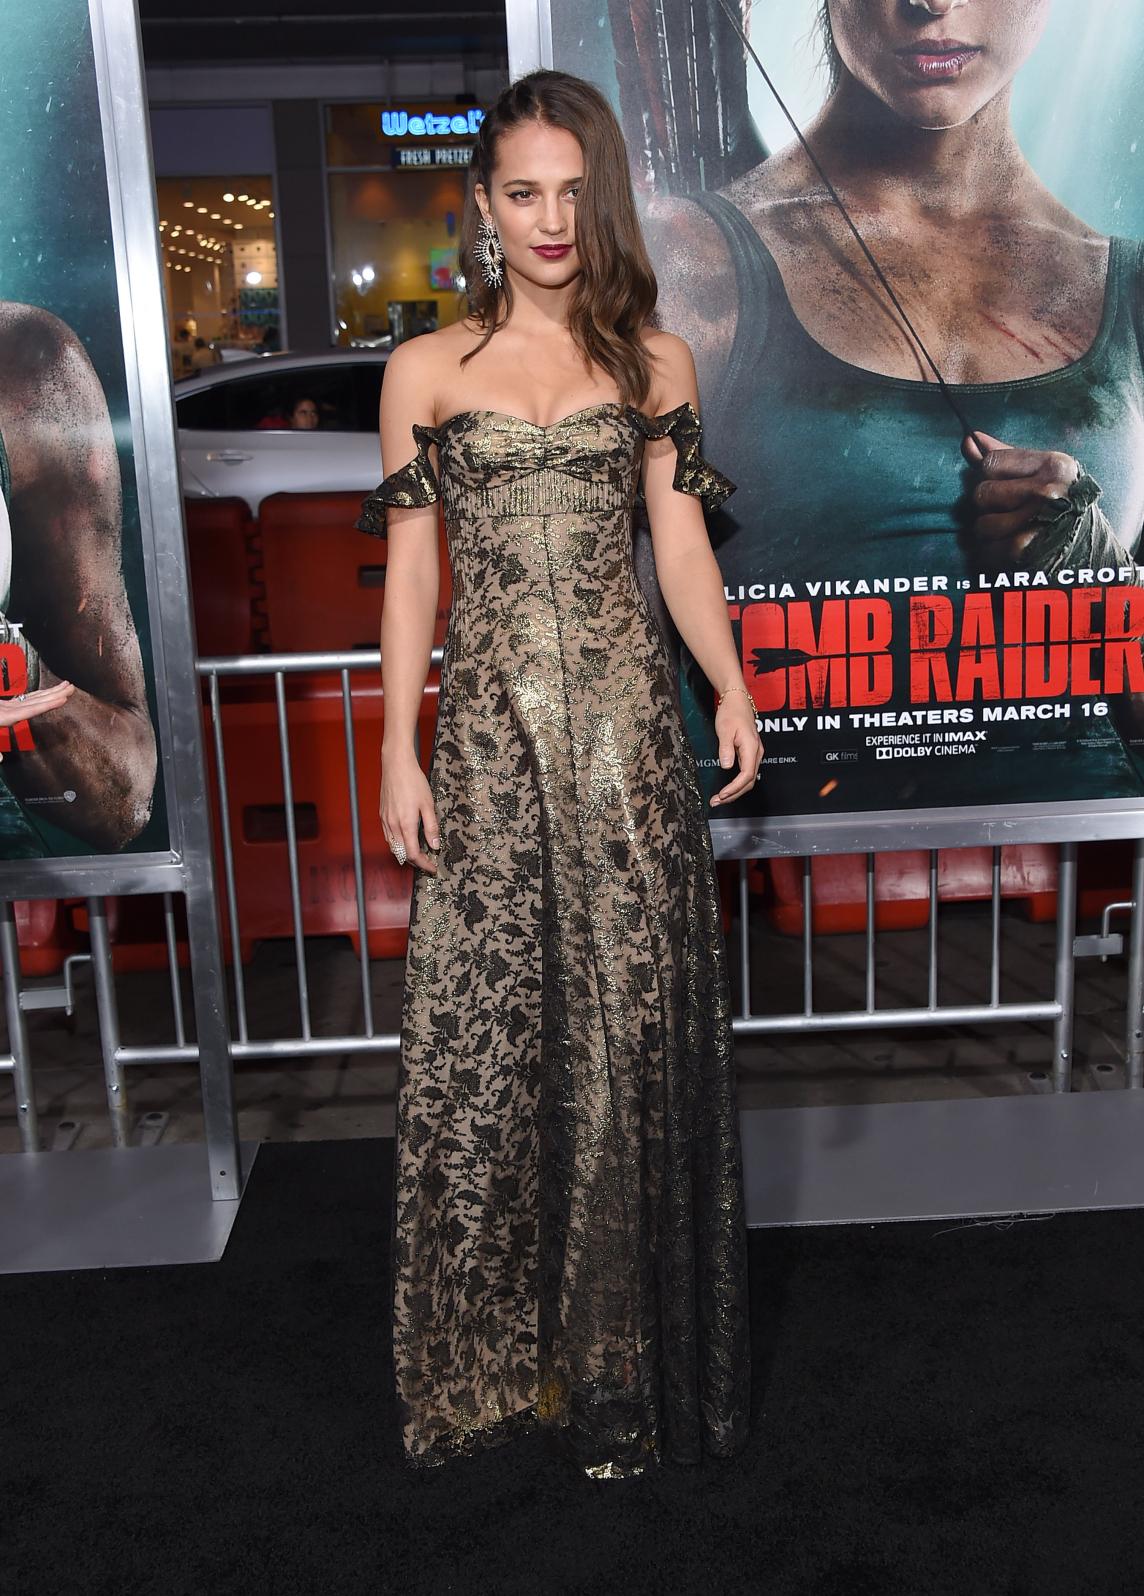 Actress Alicia Vikander